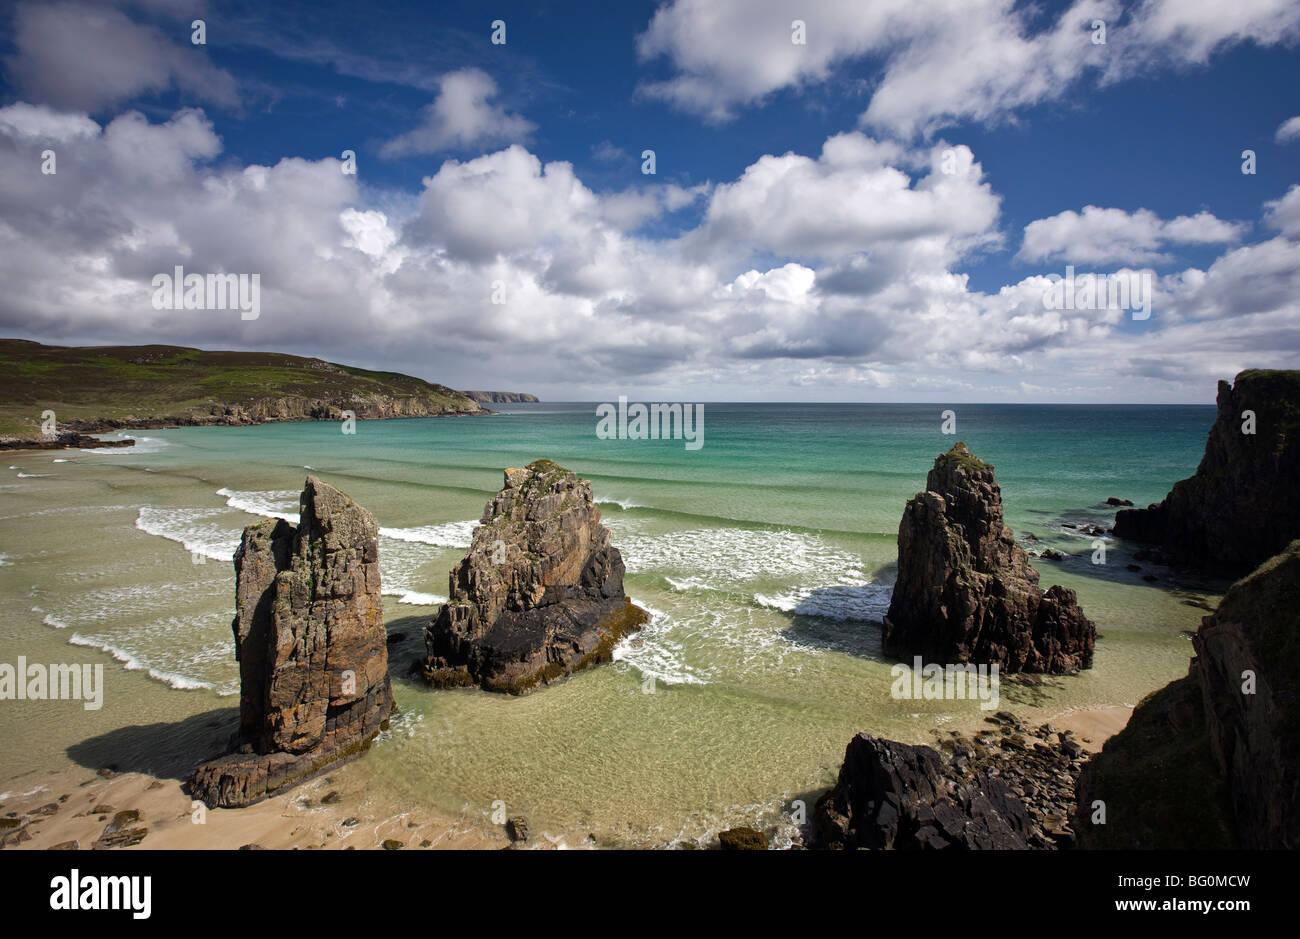 Sea stacks on Garry Beach, Tolsta, Isle of Lewis, Outer Hebrides, Scotland, United Kingdom, Europe - Stock Image